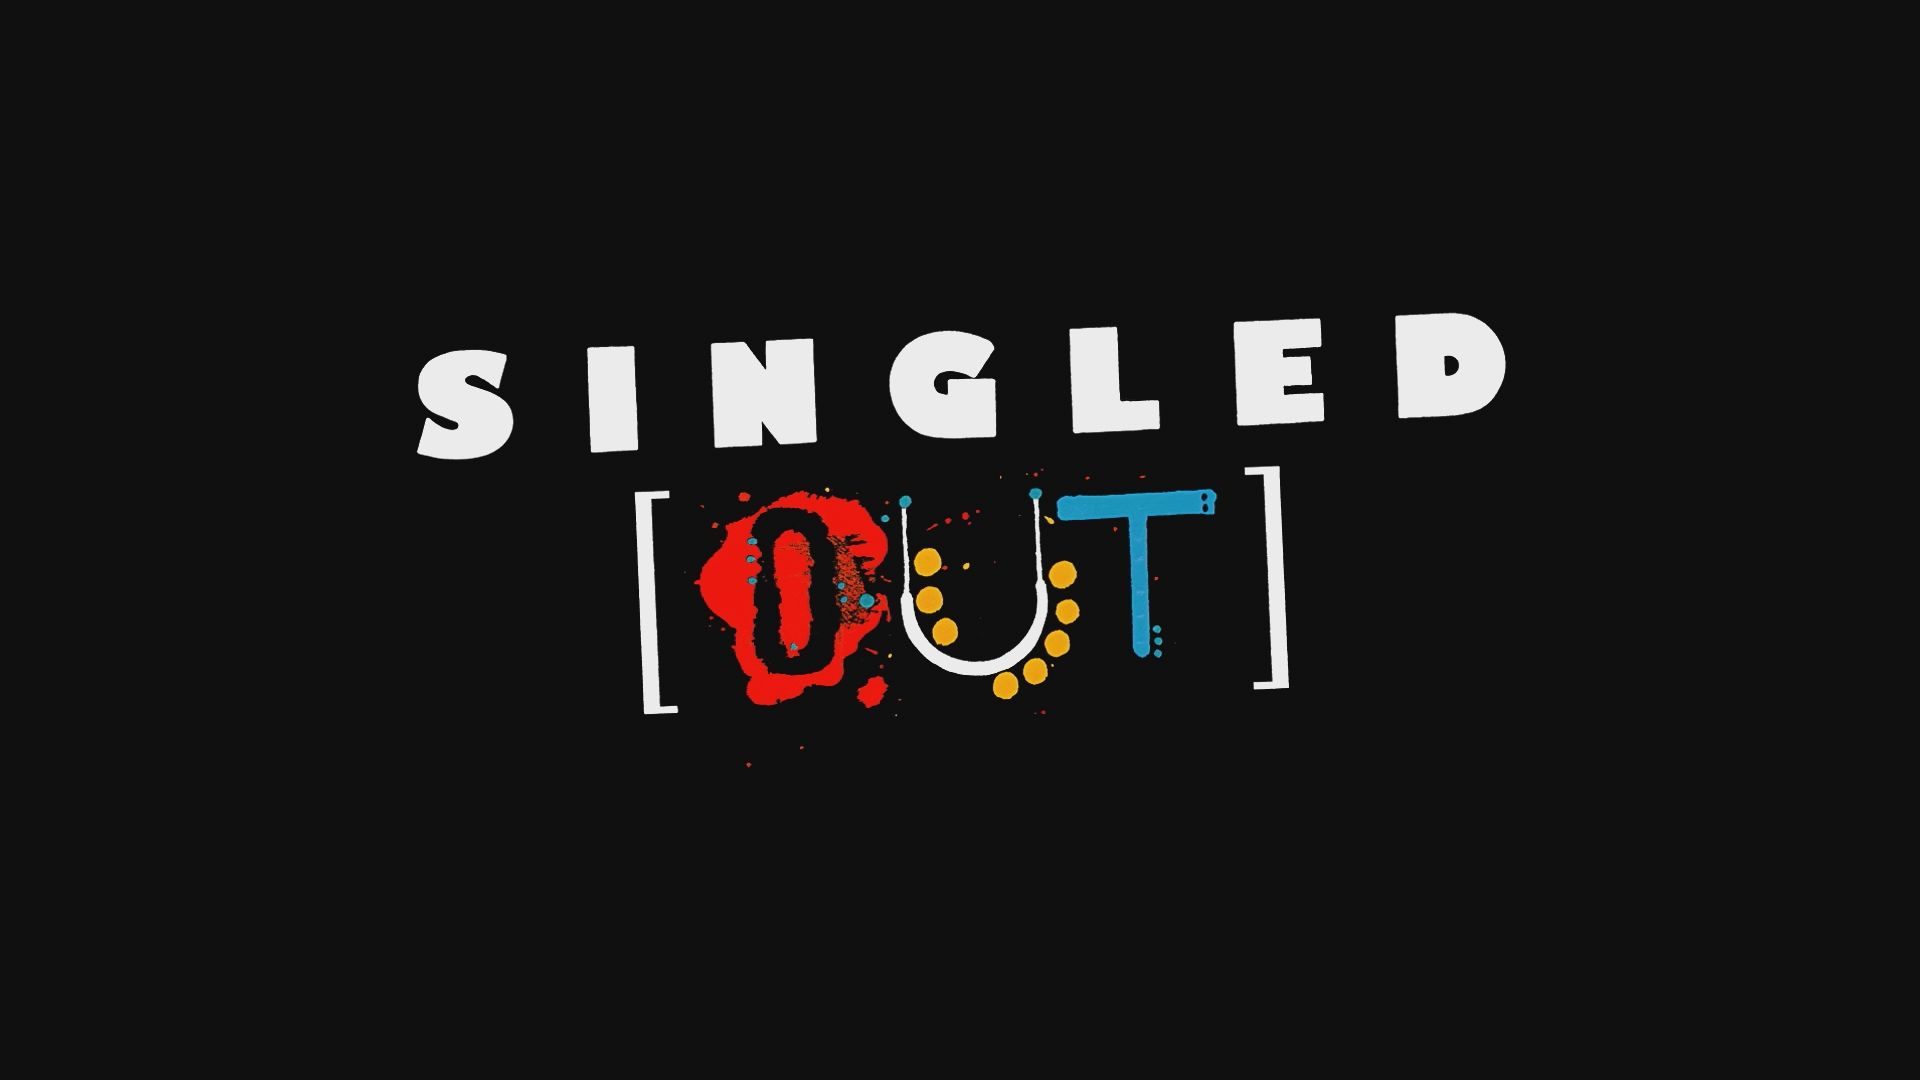 Single_Out_Antaviana